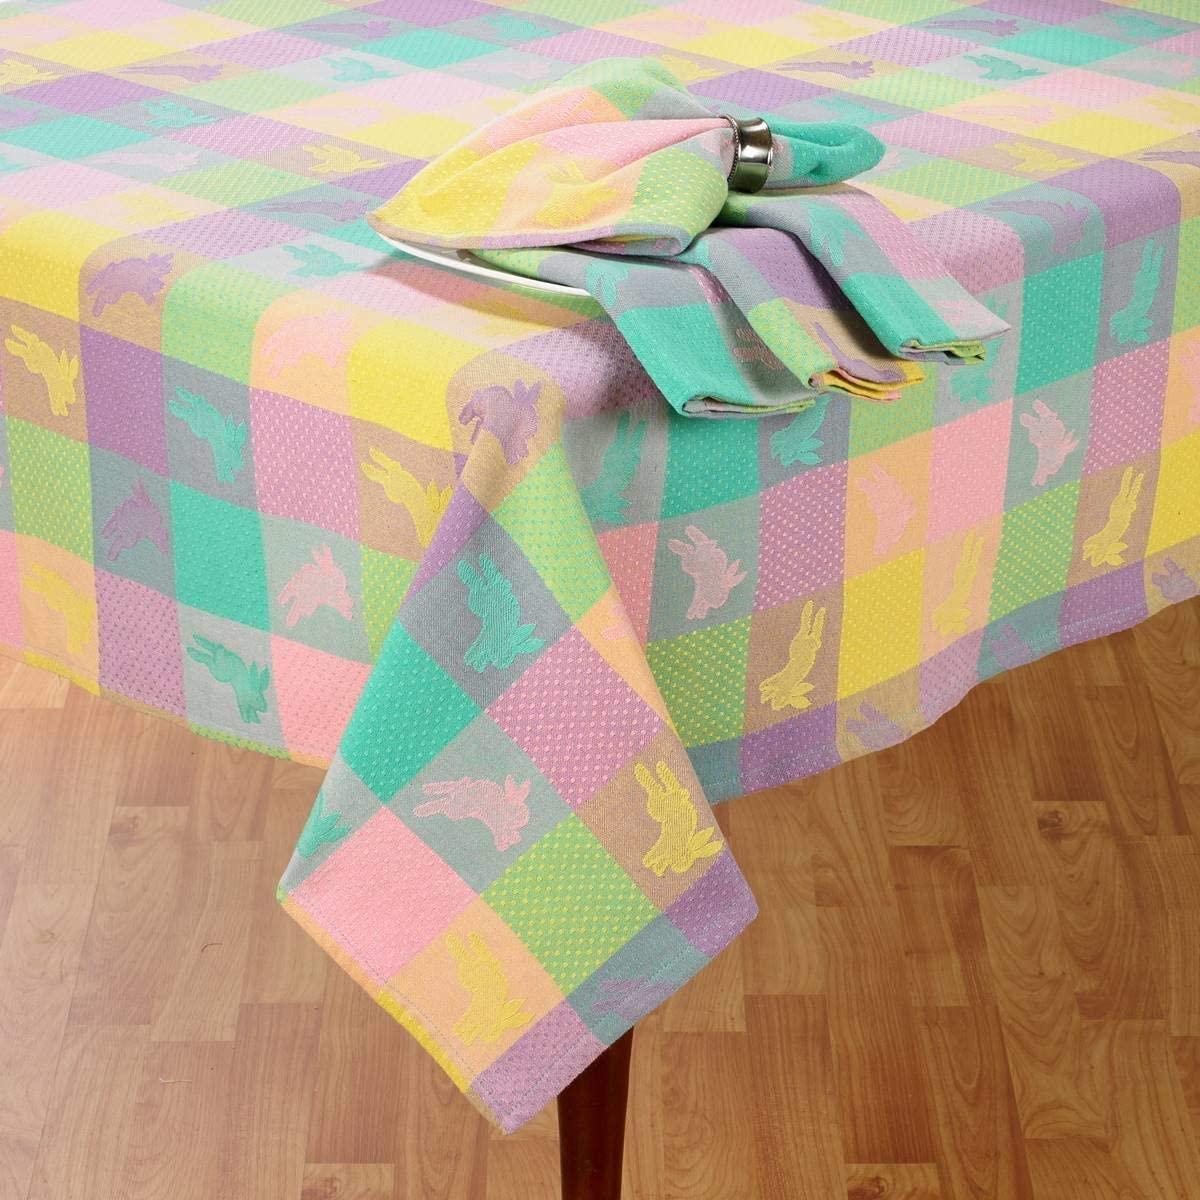 Lintex Linens Hoppy Easter Jacquard Tablecloth (60x84)